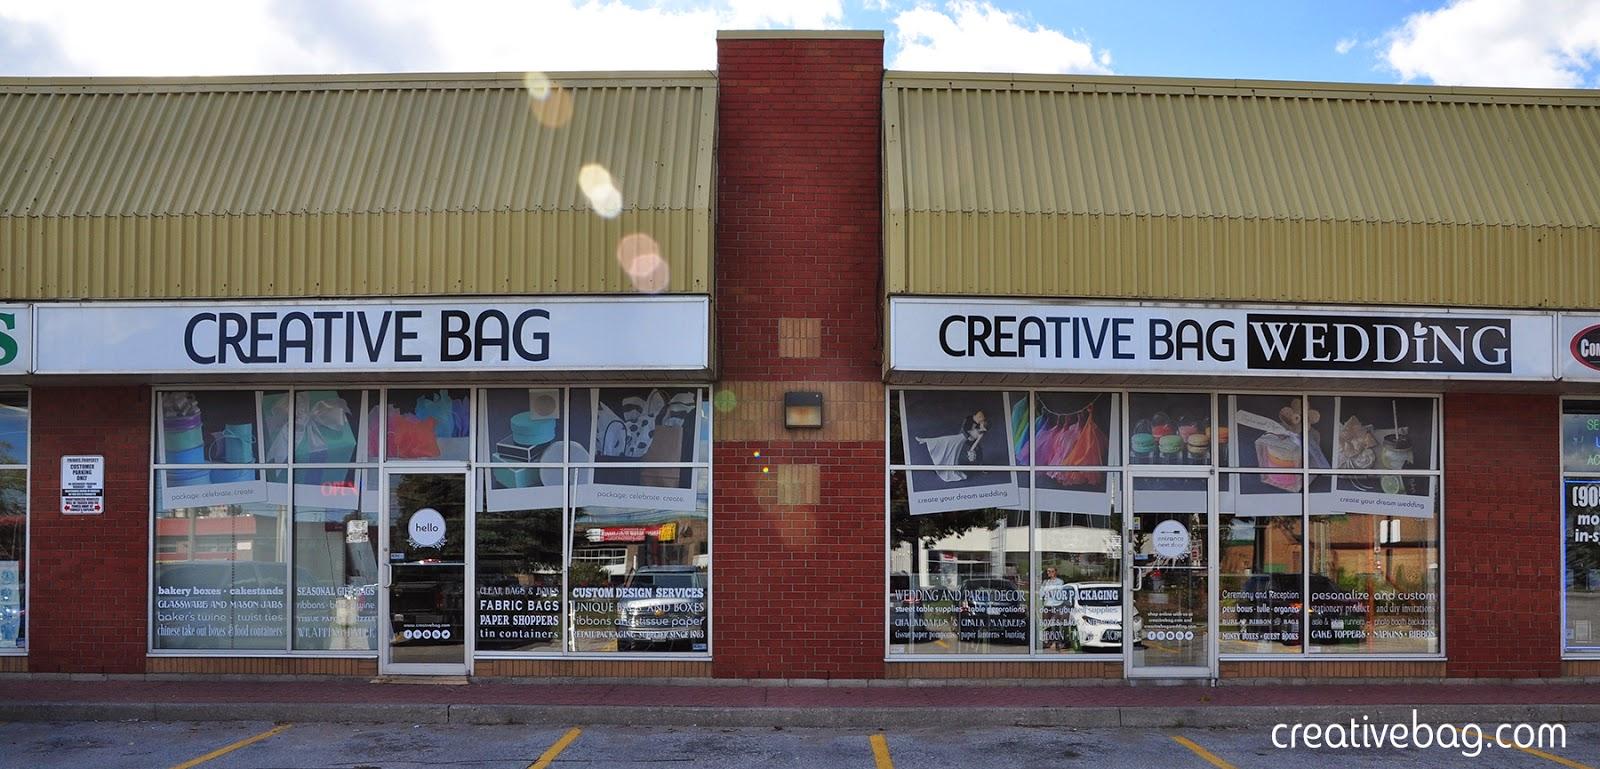 hello and welcome to Creative Bag Pickering | creativebag.com